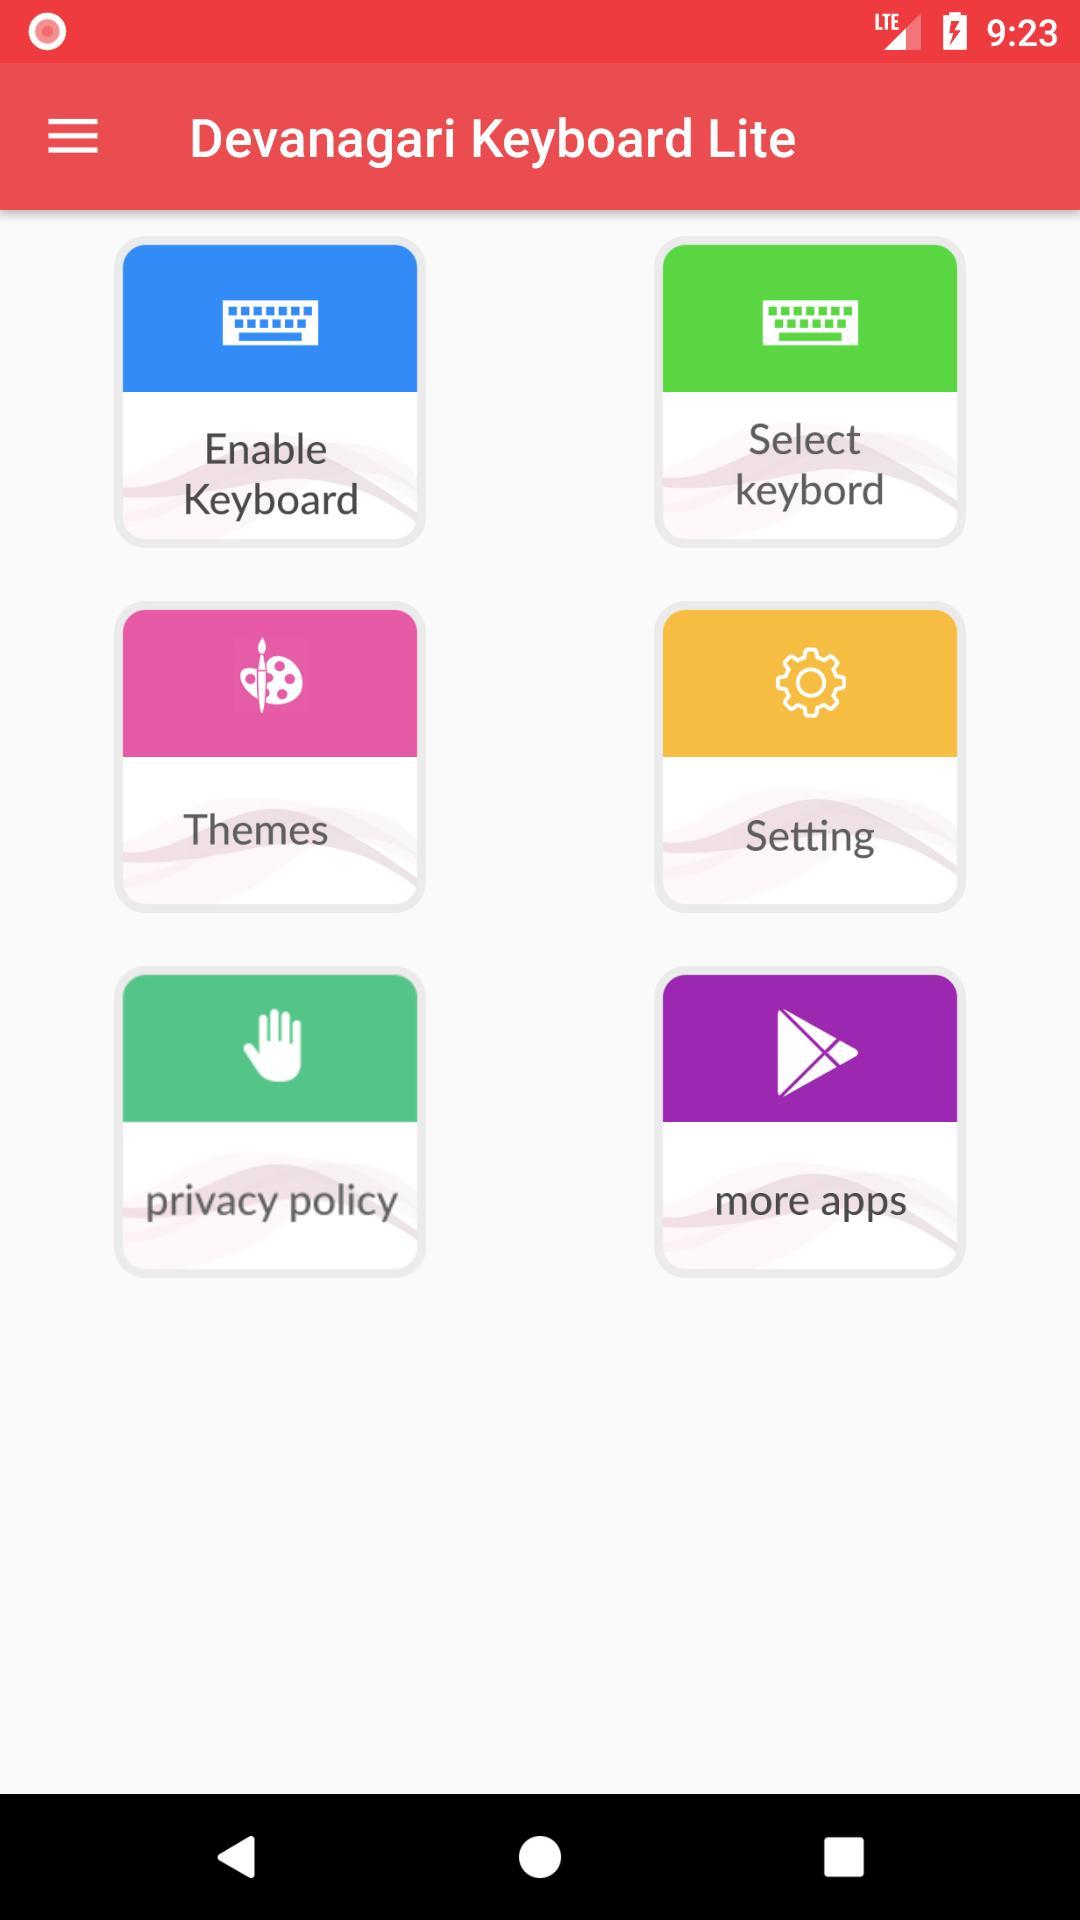 Devanagari Keyboard Lite for Android - APK Download